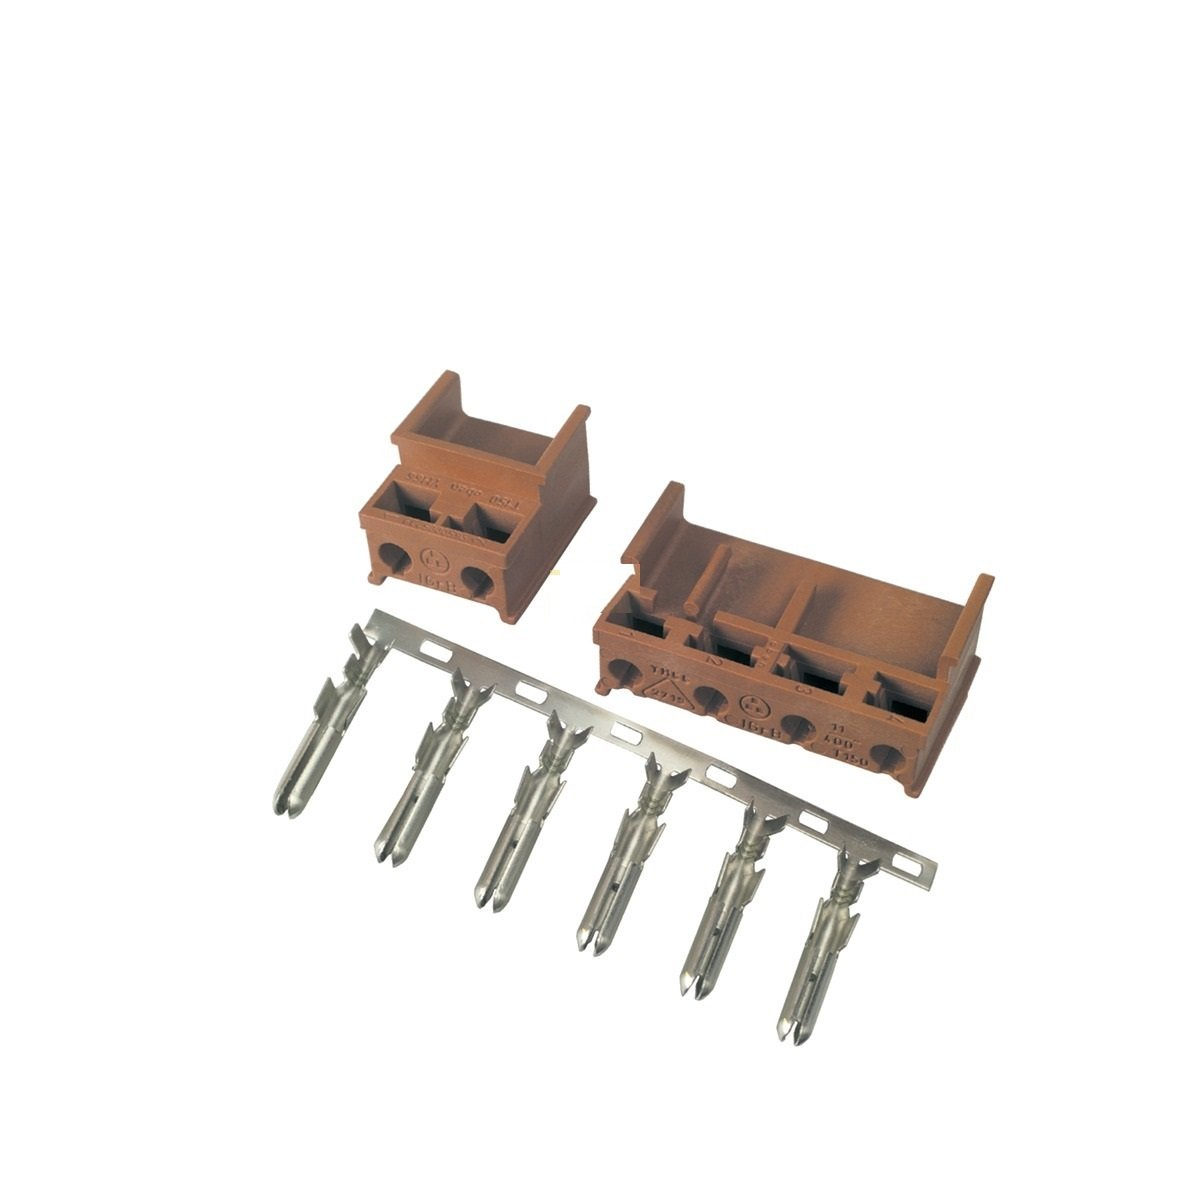 ORIGINAL Adapterkabel für Kochfeld Herd Whirlpool Bauknecht Ignis 481231028168